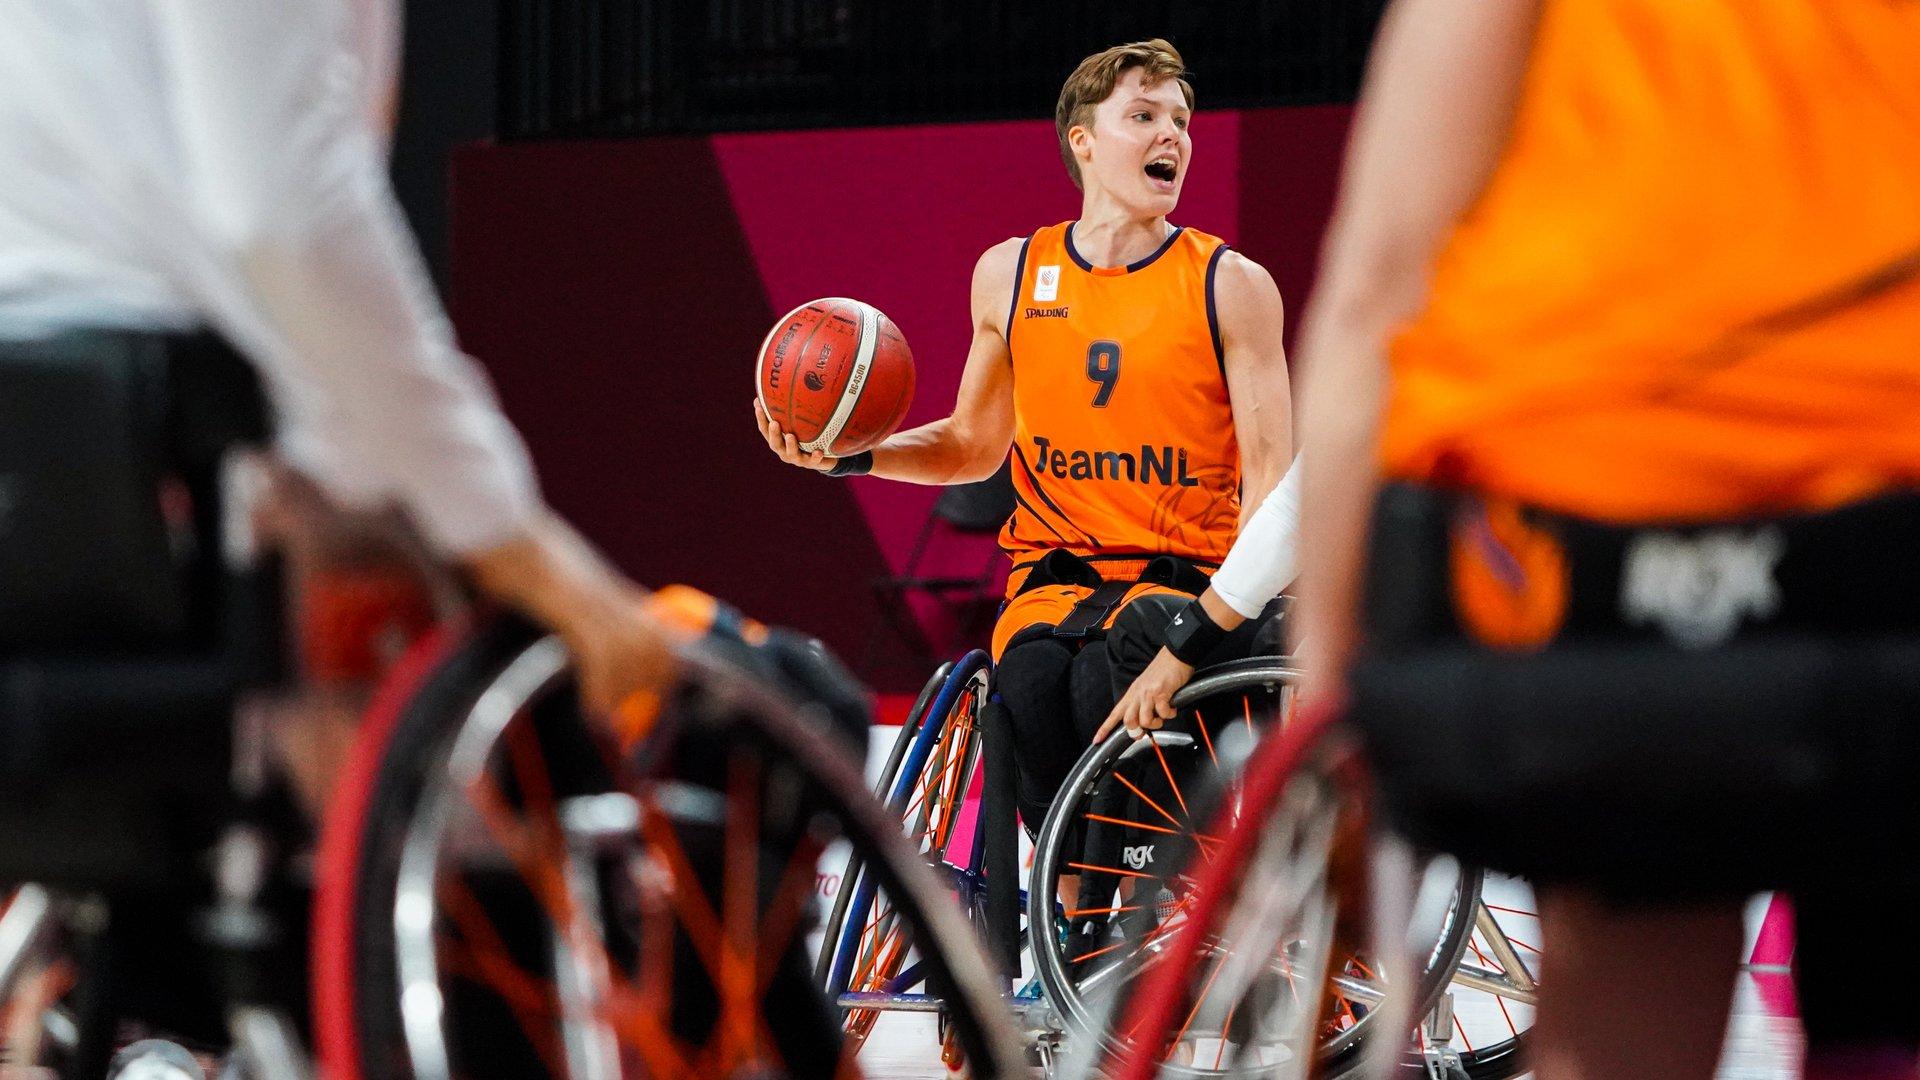 Bo KRamer Paralympische spelen.jpeg